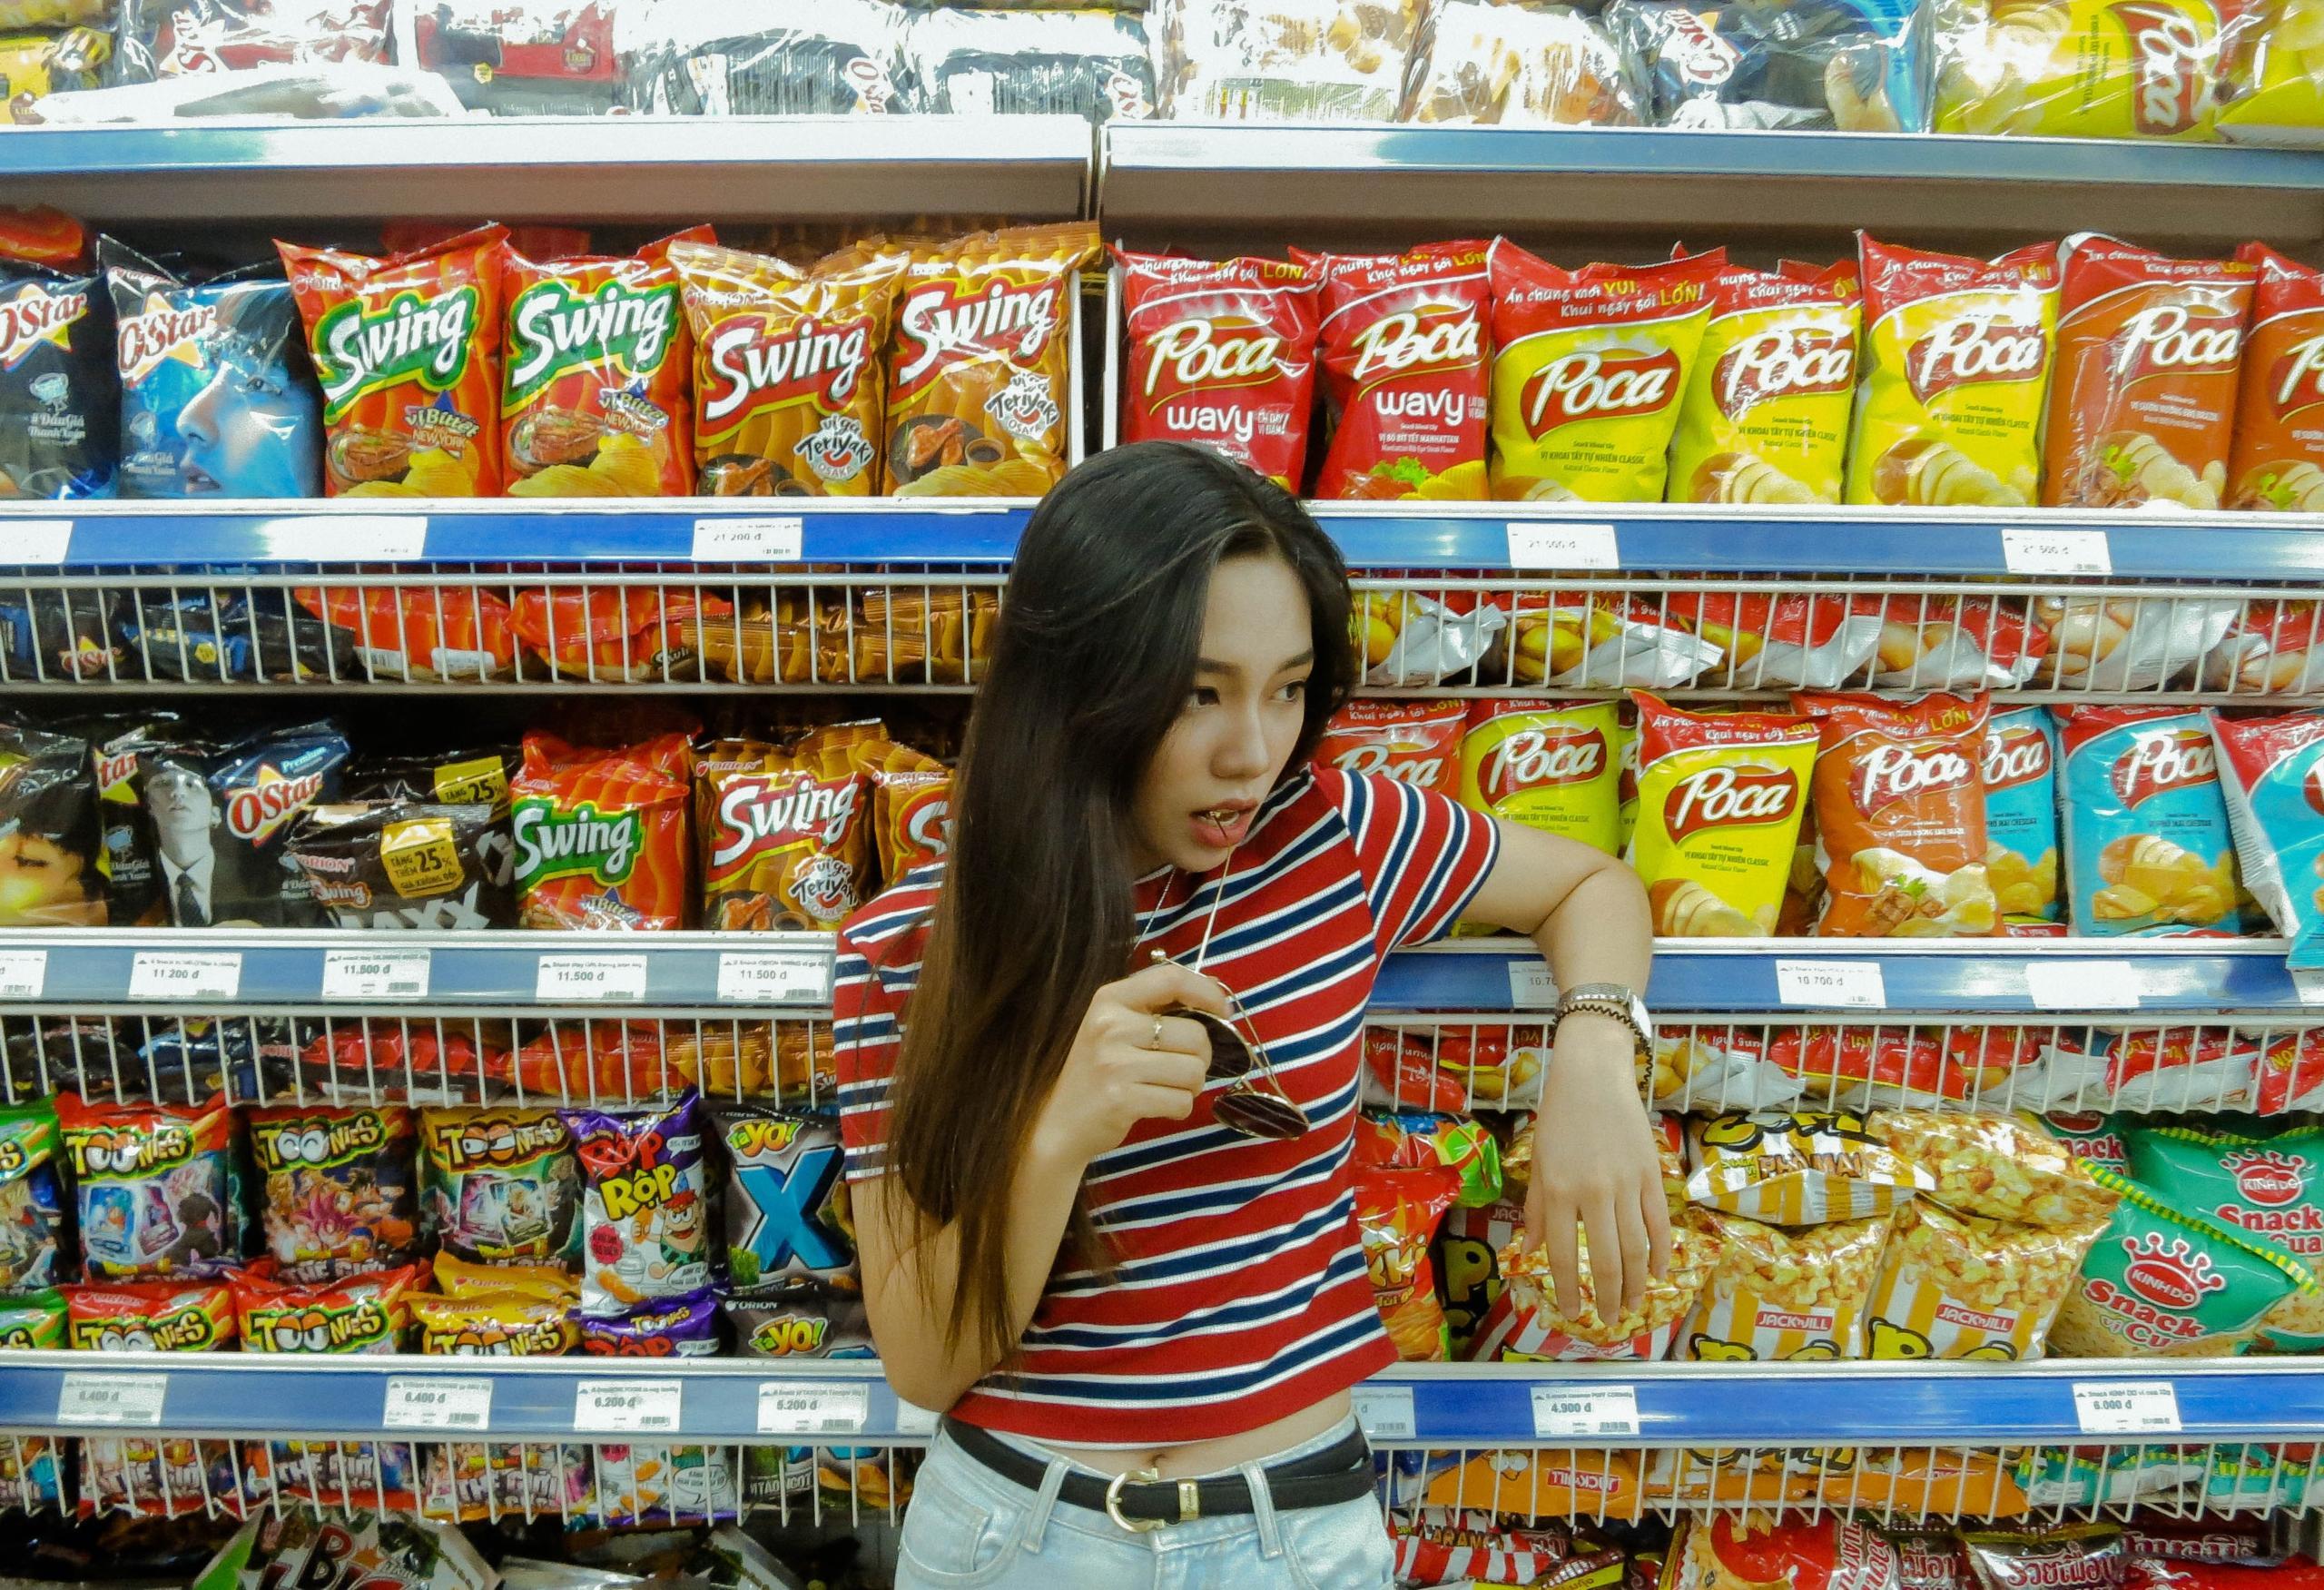 girl standing in front of food shelf